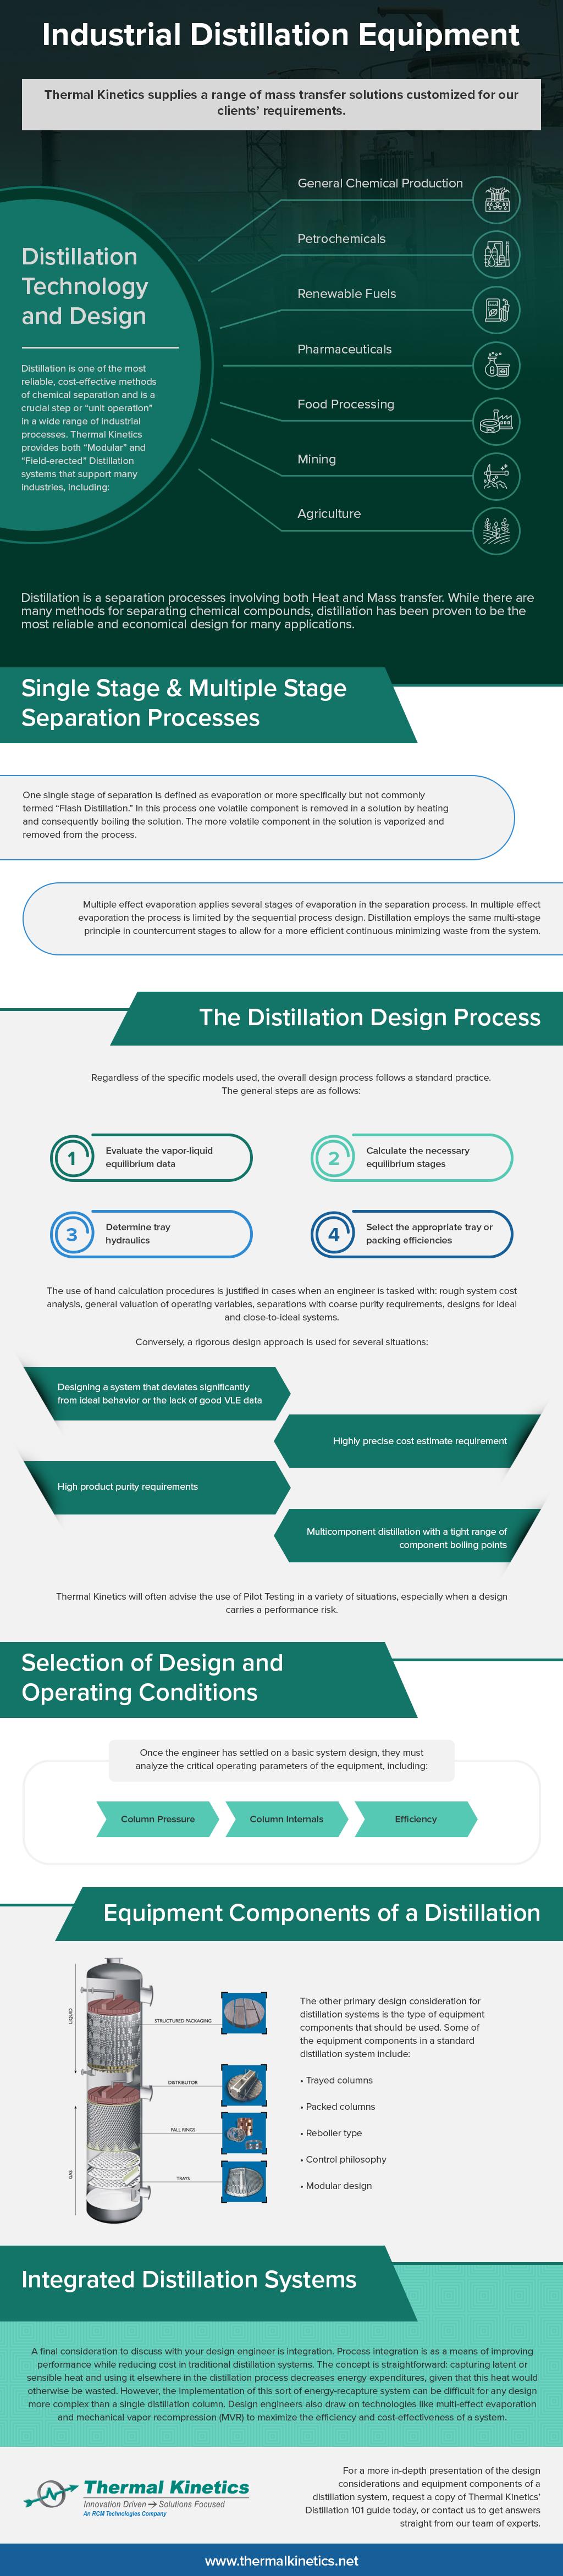 Industrial Distillation Equipment Infographic